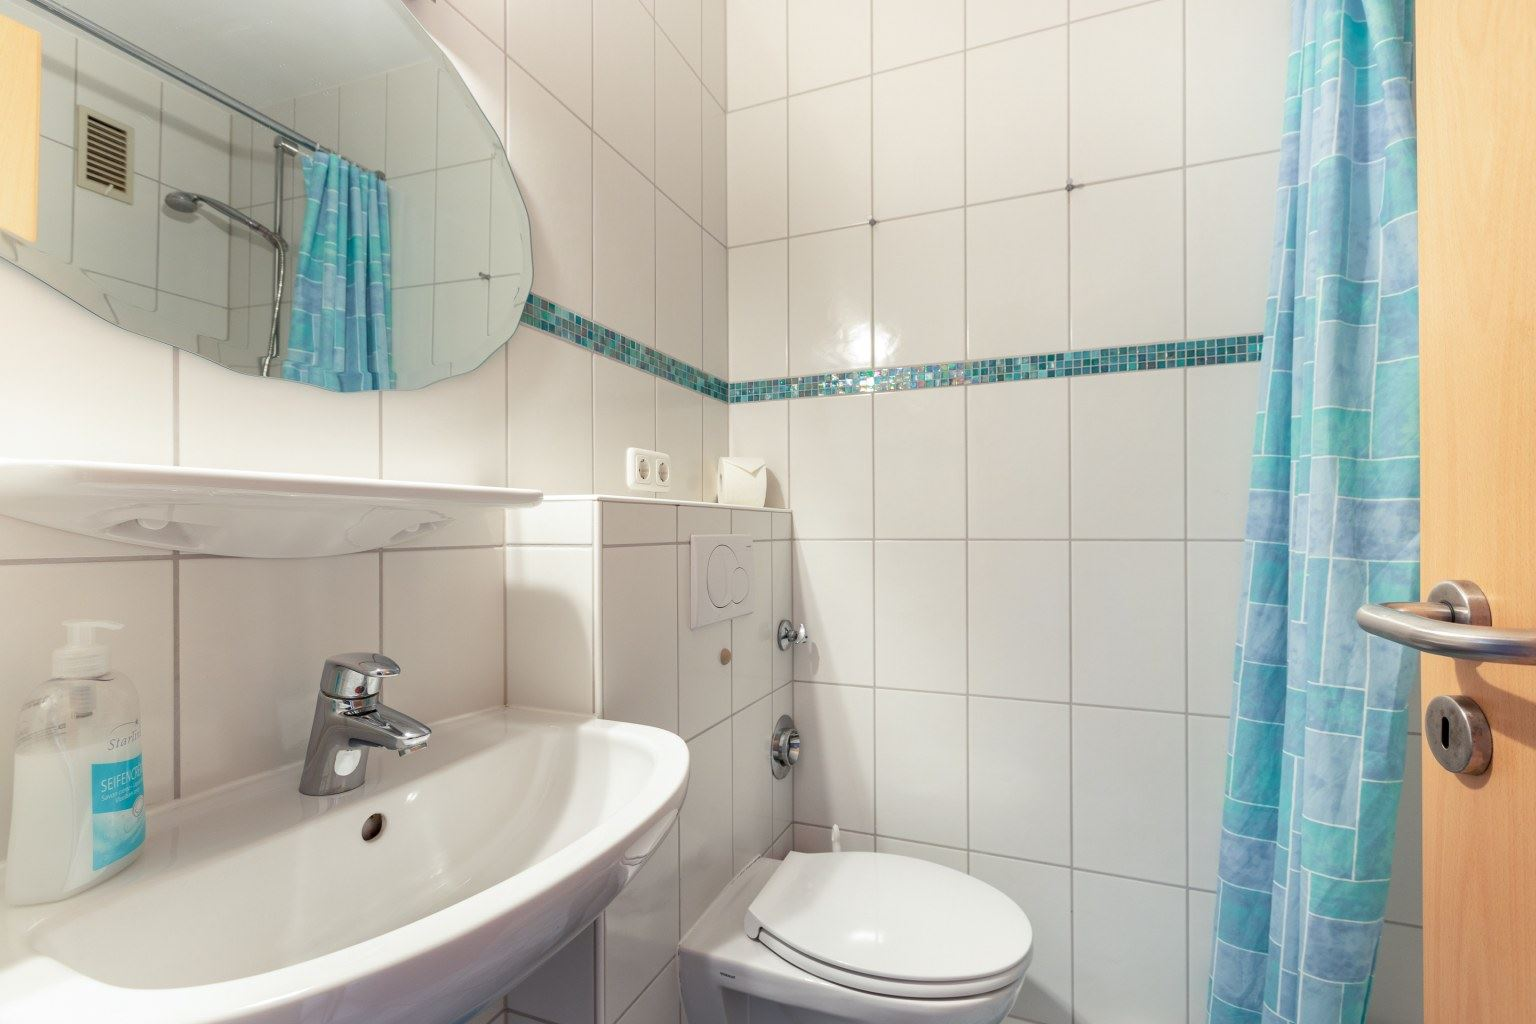 Badezimmer, Ferienwohnung 5, St Peter Ording Bad, Haus Atlantic,  Alter Badweg 11-15